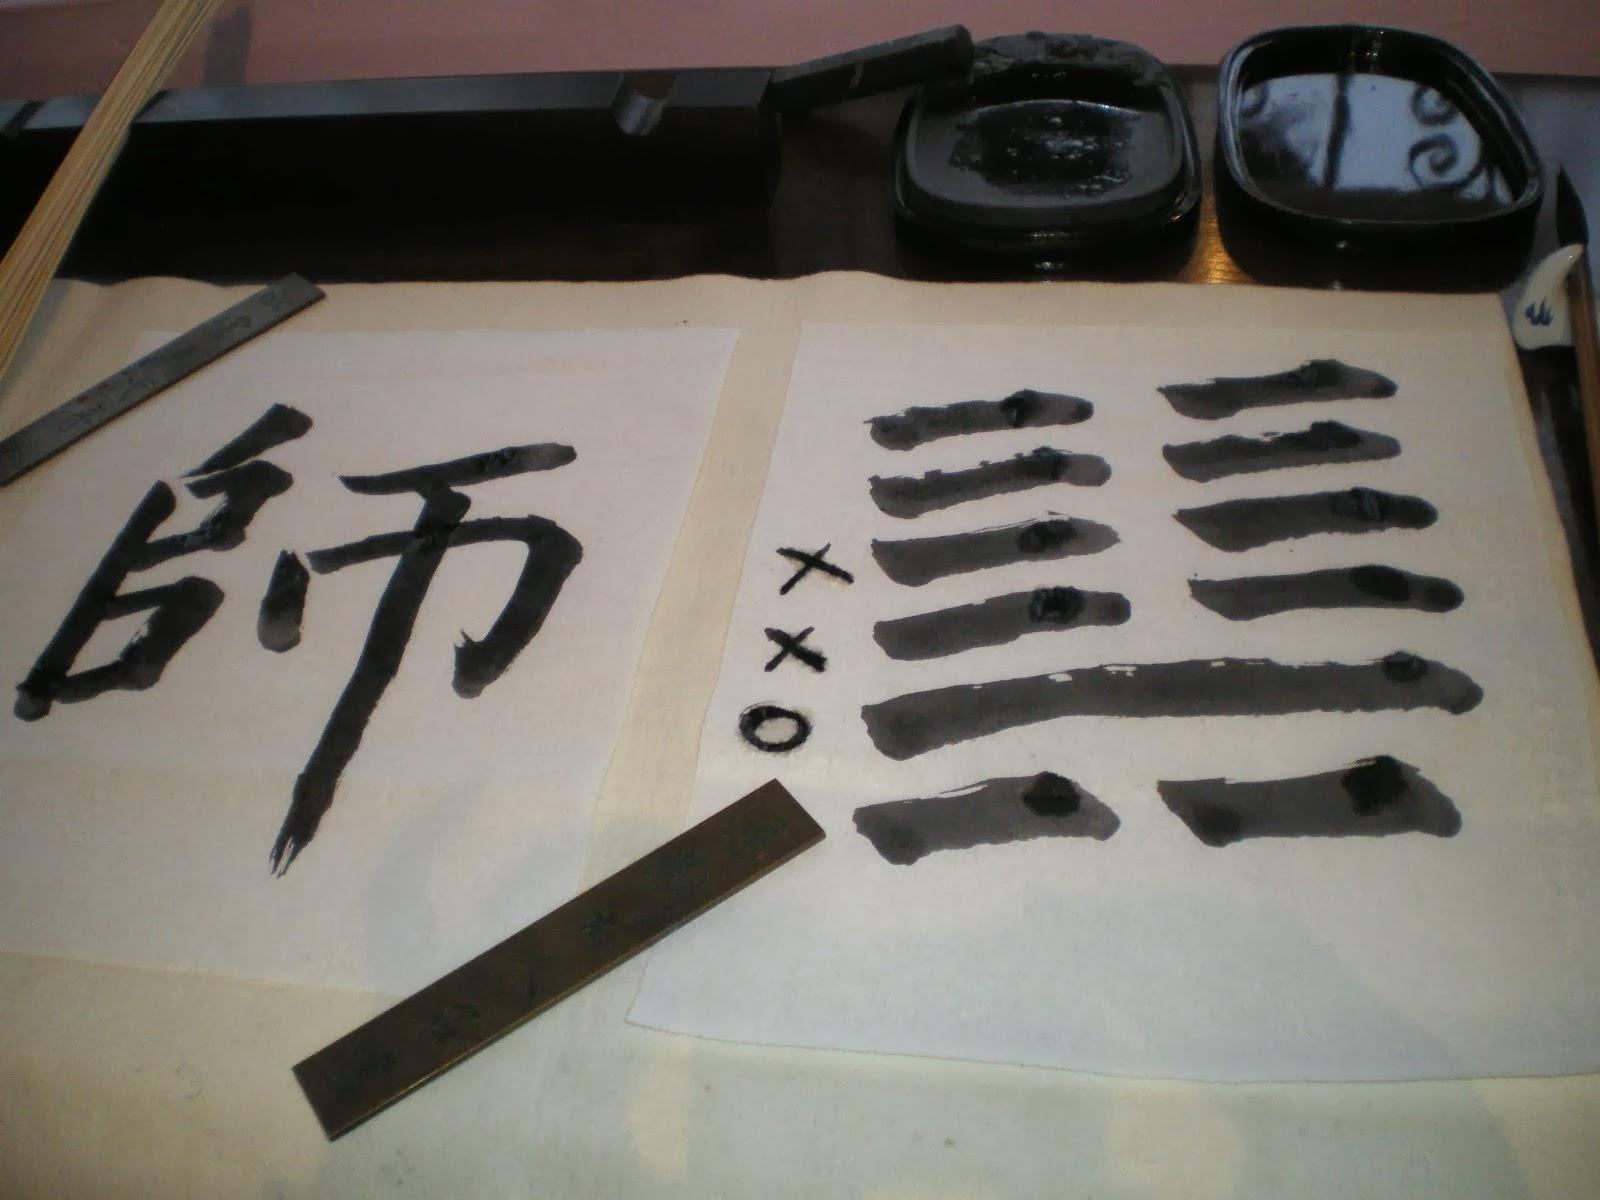 Consulta de I Ching